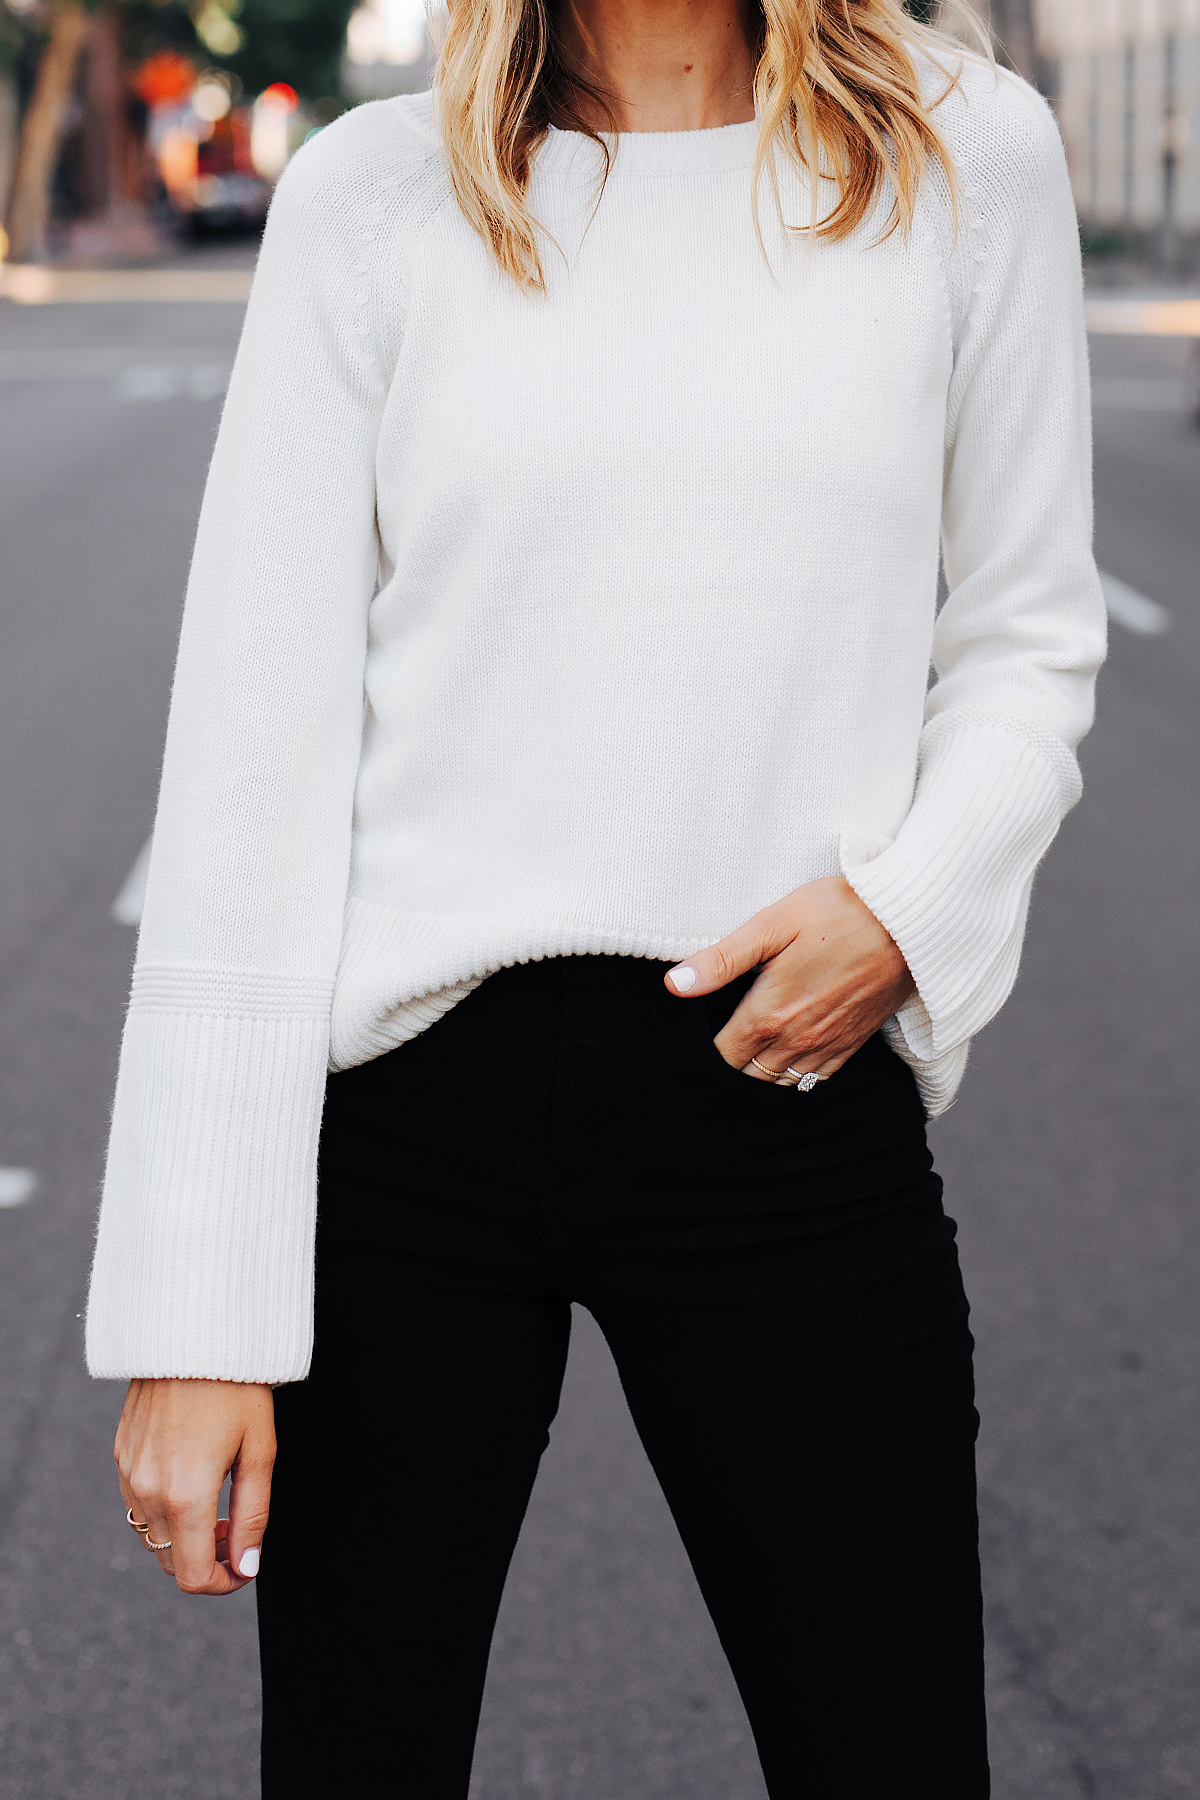 Fashion Jackson Wearing Ann Taylor White Sweater Black Skinny Jeans